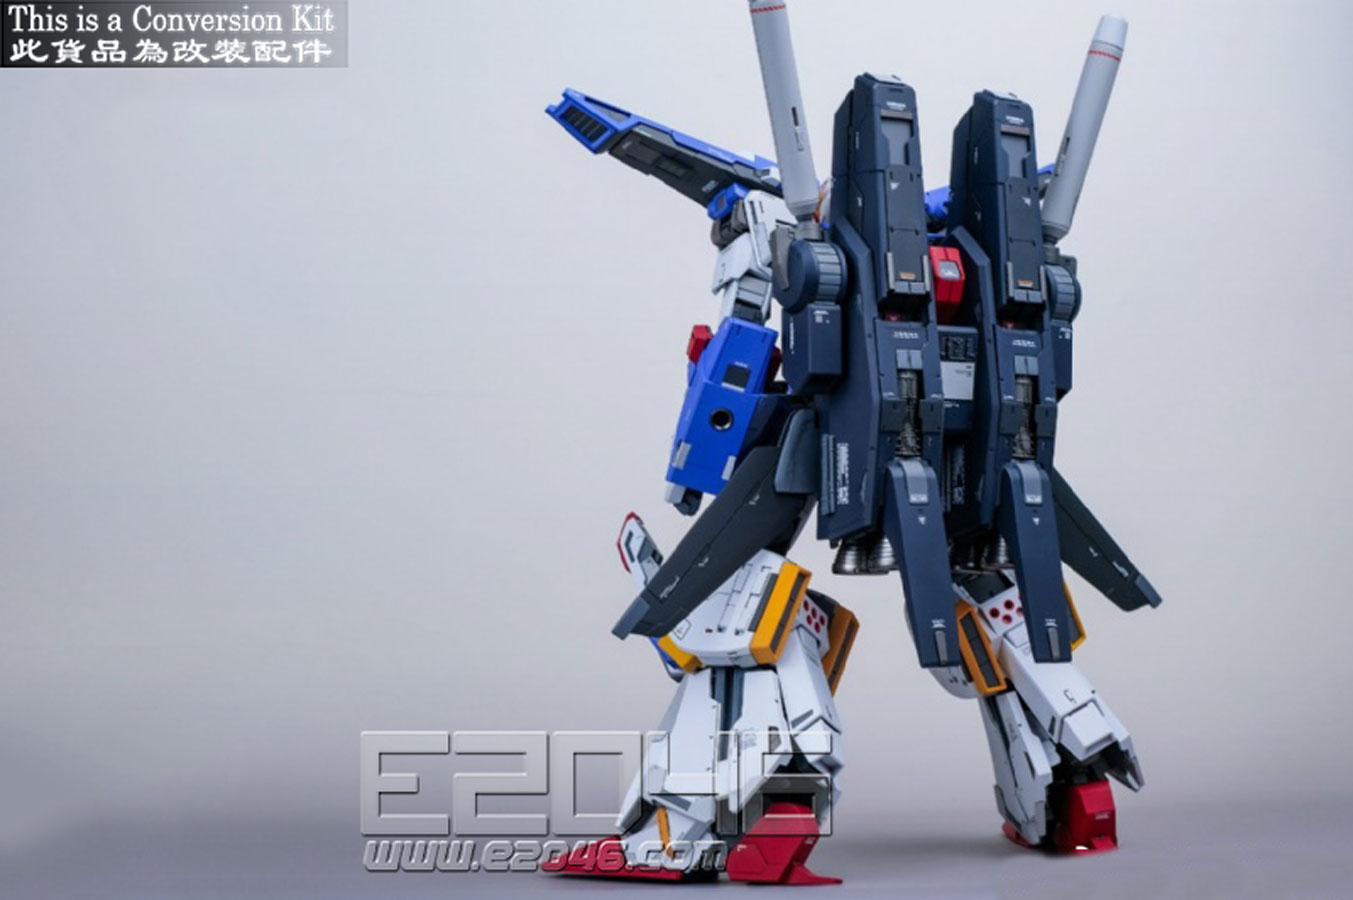 ZZ Gundam Conversion Kit